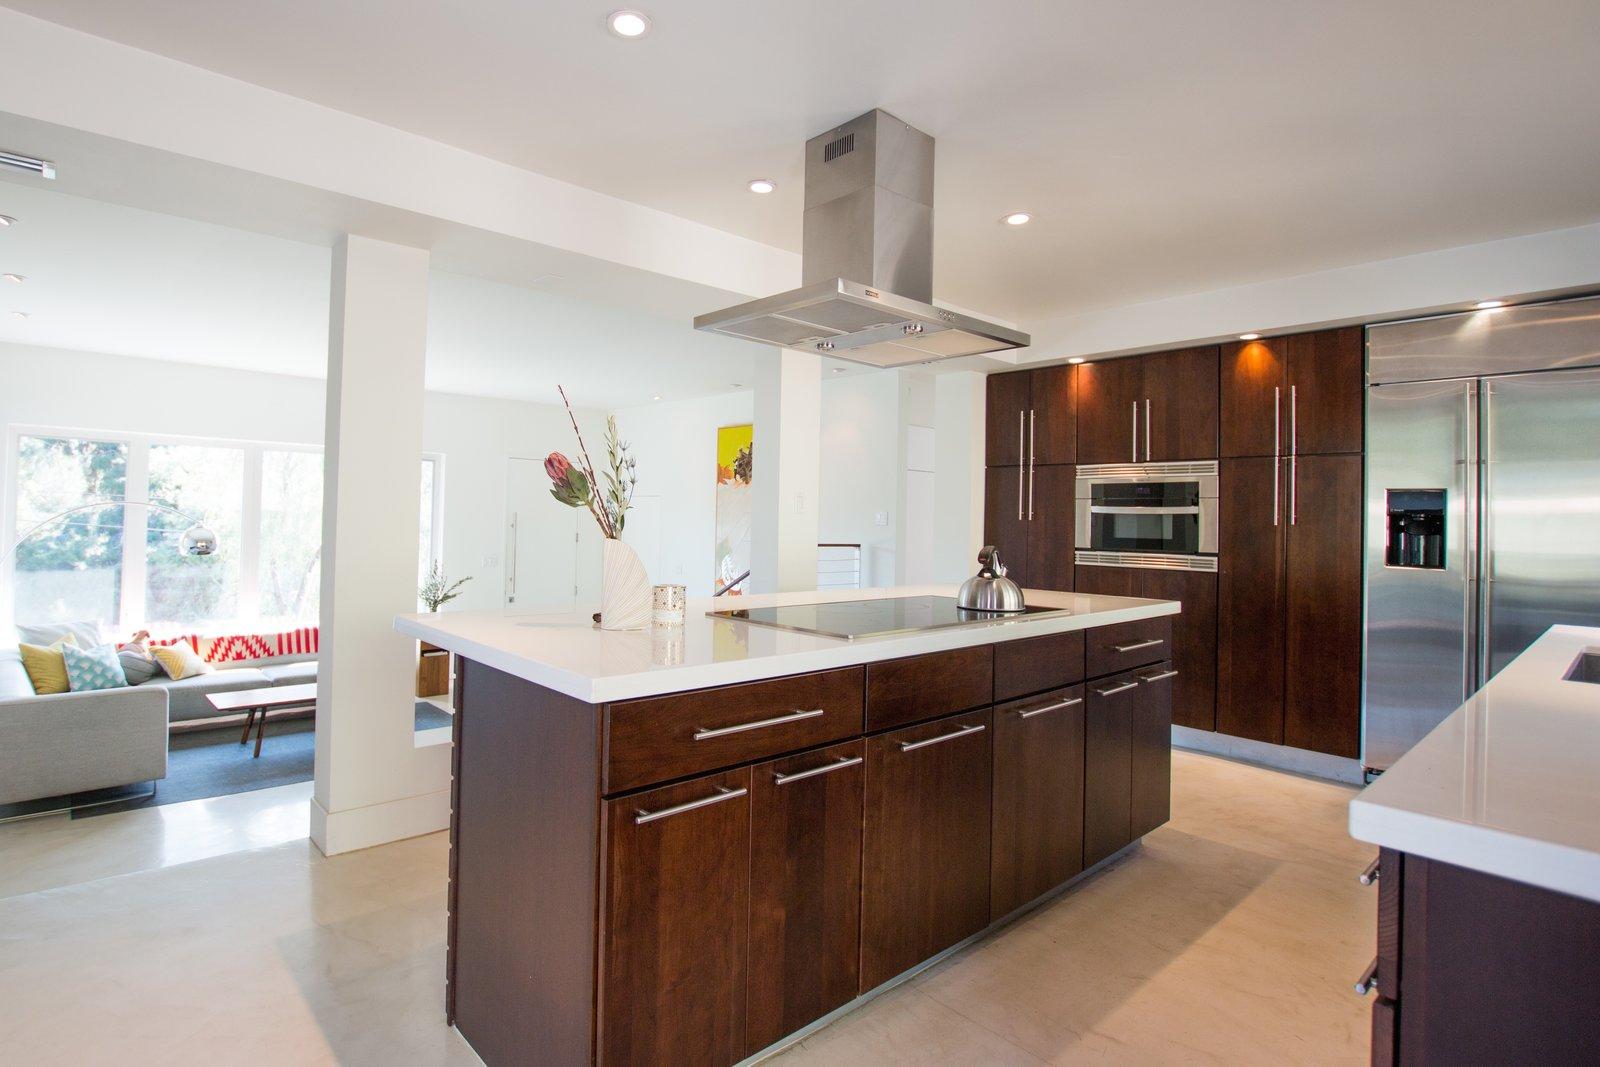 Custom Kitchen: Solid Cherry Casework, Quartz Countertops + Polished Concrete Floors  Edgewood